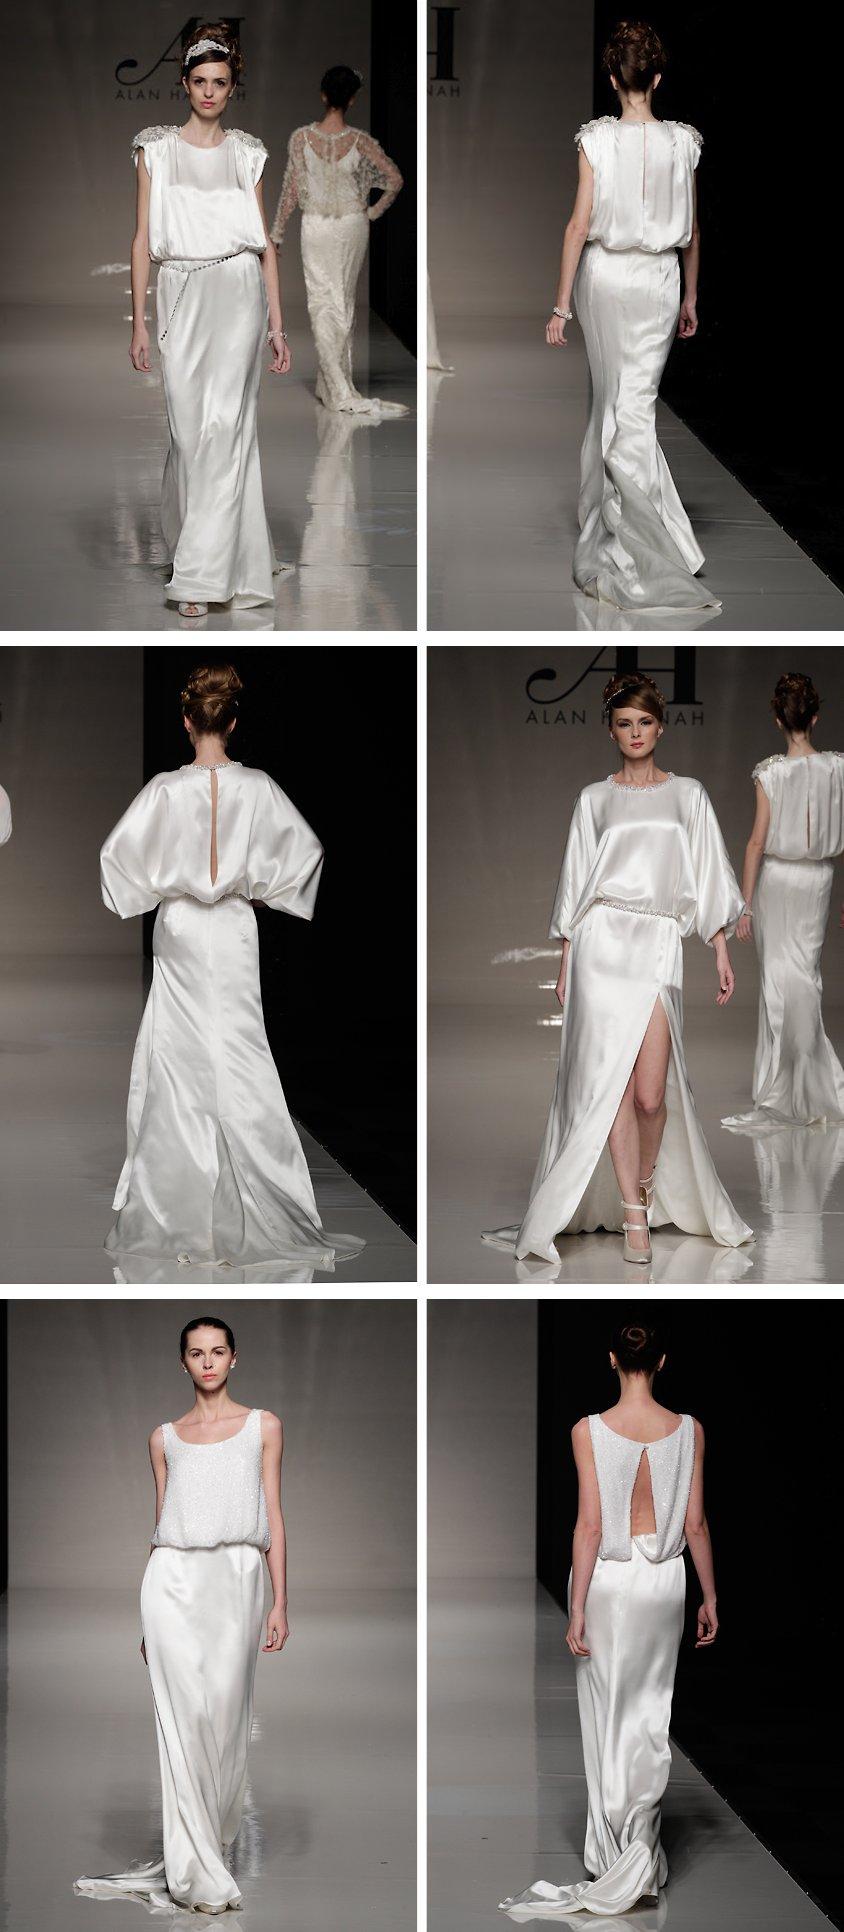 2013-wedding-dresses-bridal-gown-inspiration-white-gallery-london-blouson-bridal-trend.full